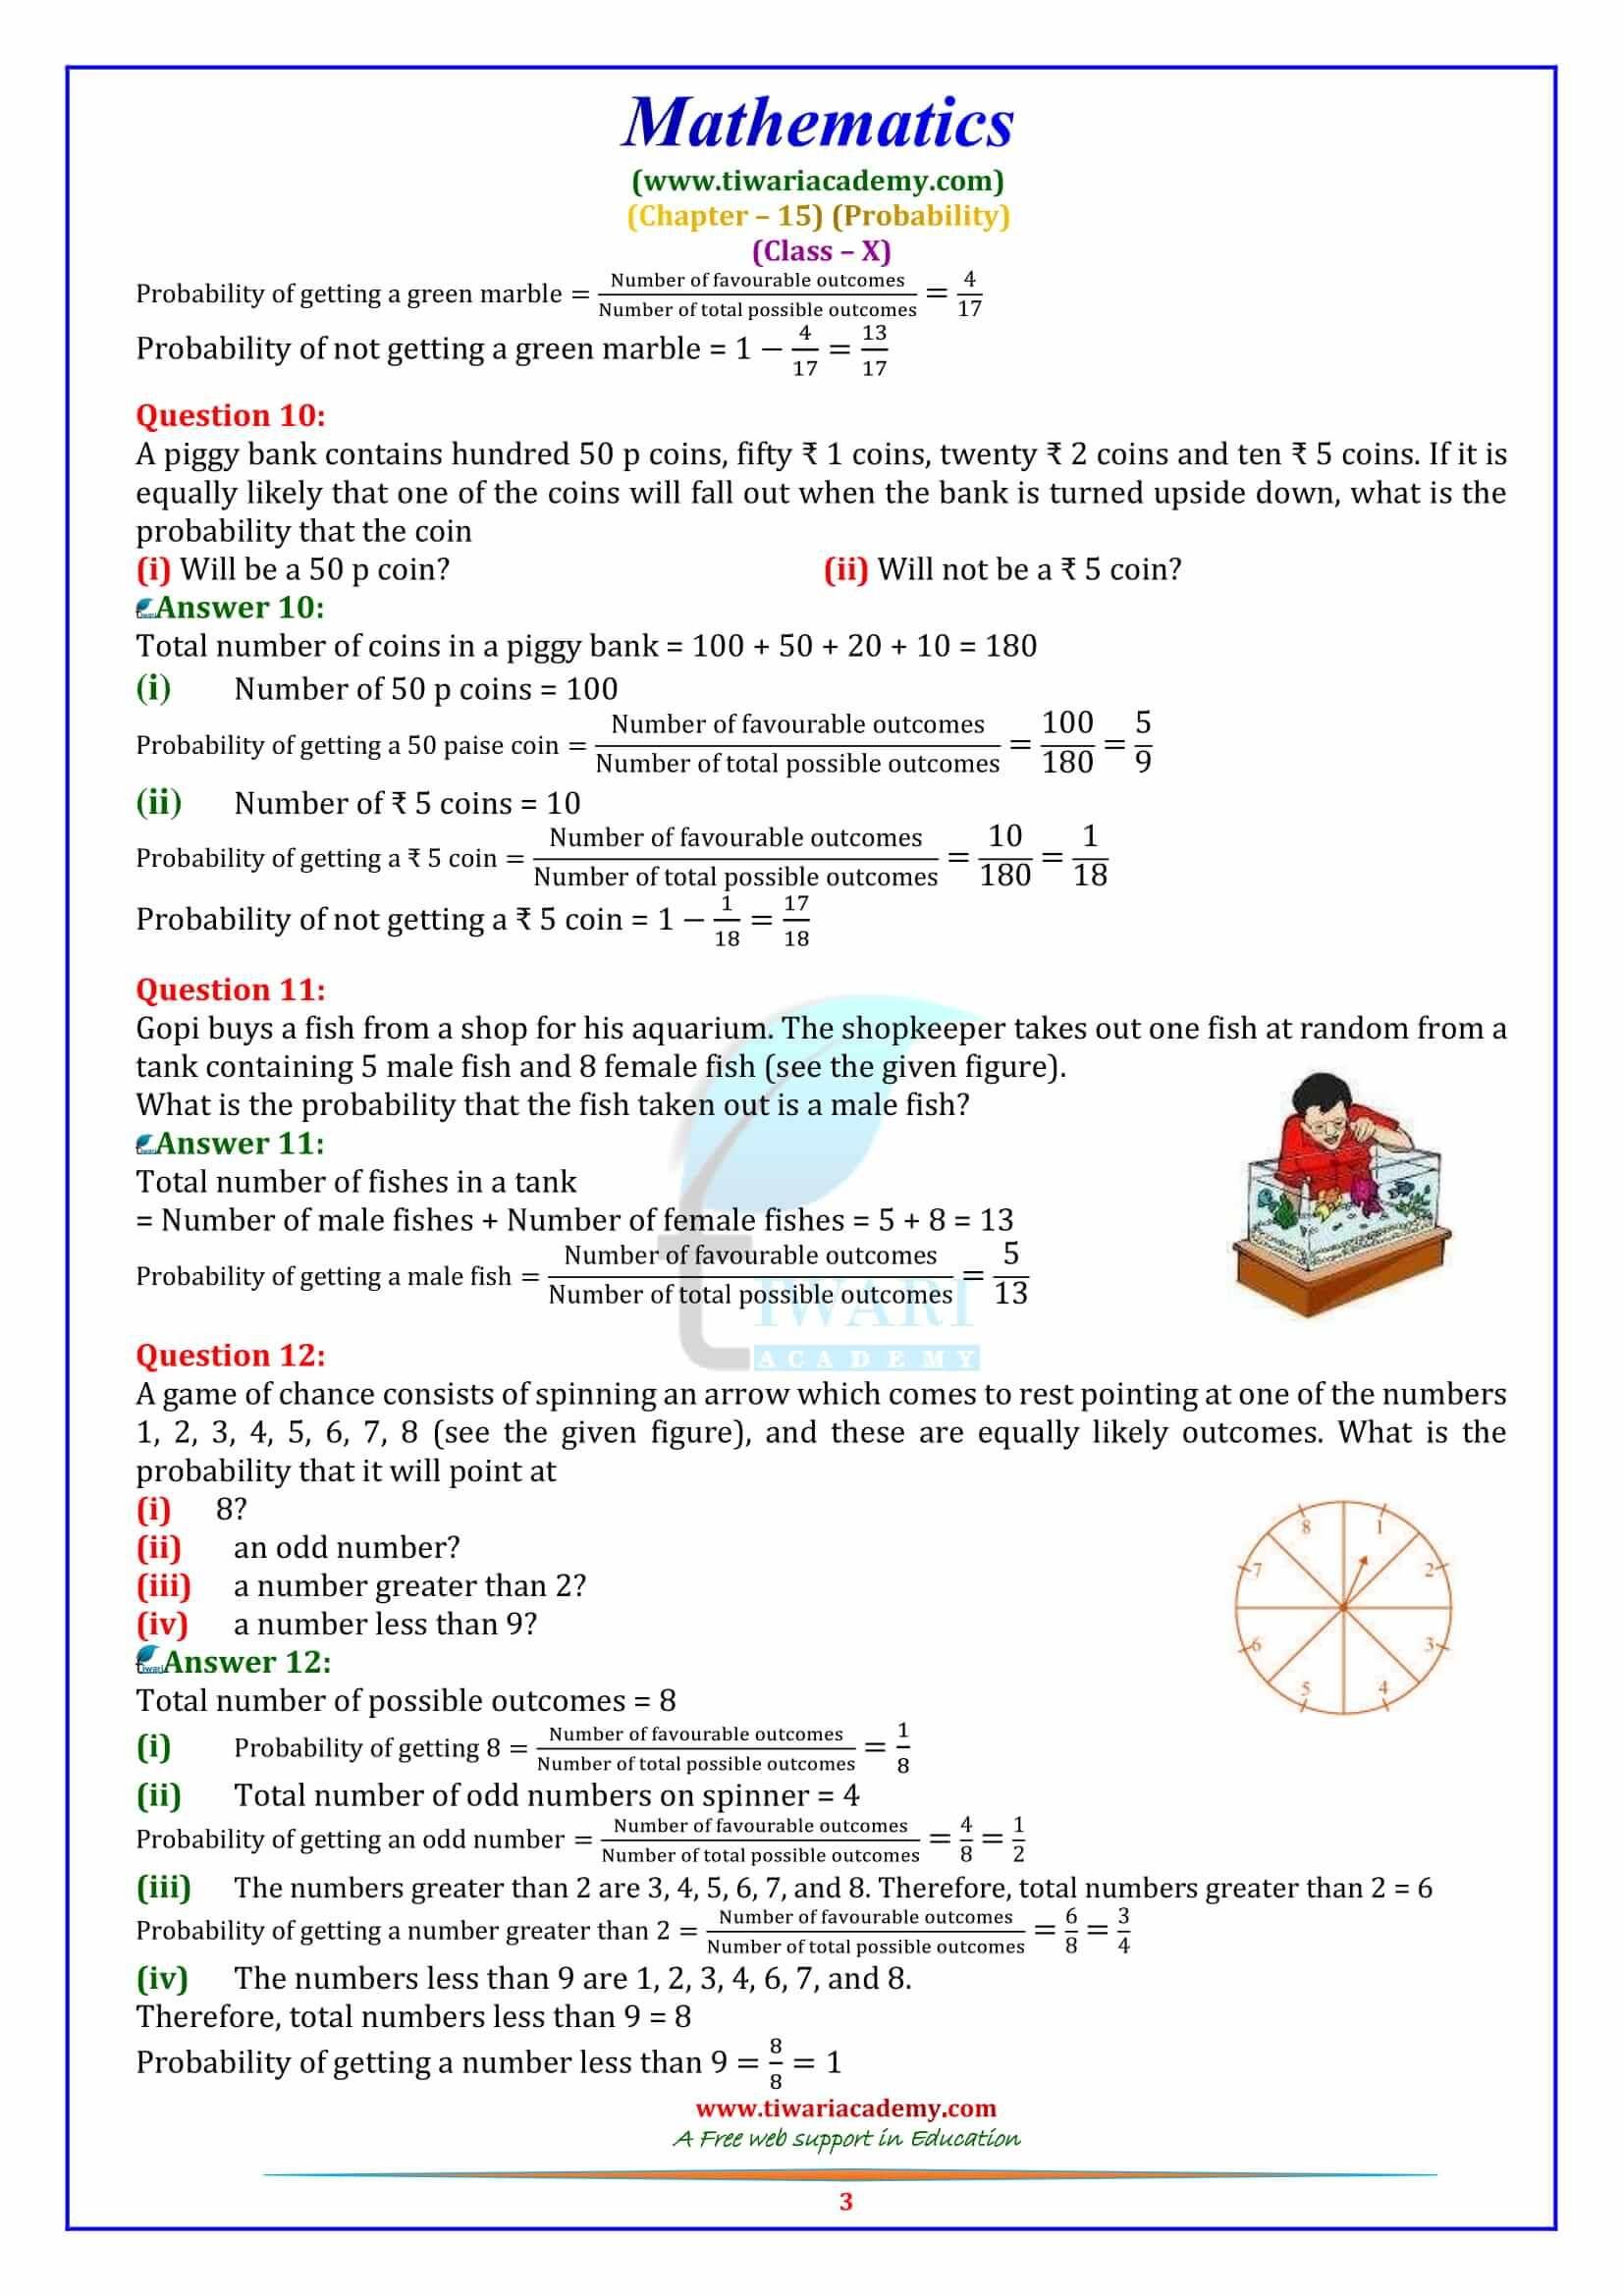 10 Maths Solutions Maths Solutions Math Solutions [ 2339 x 1653 Pixel ]